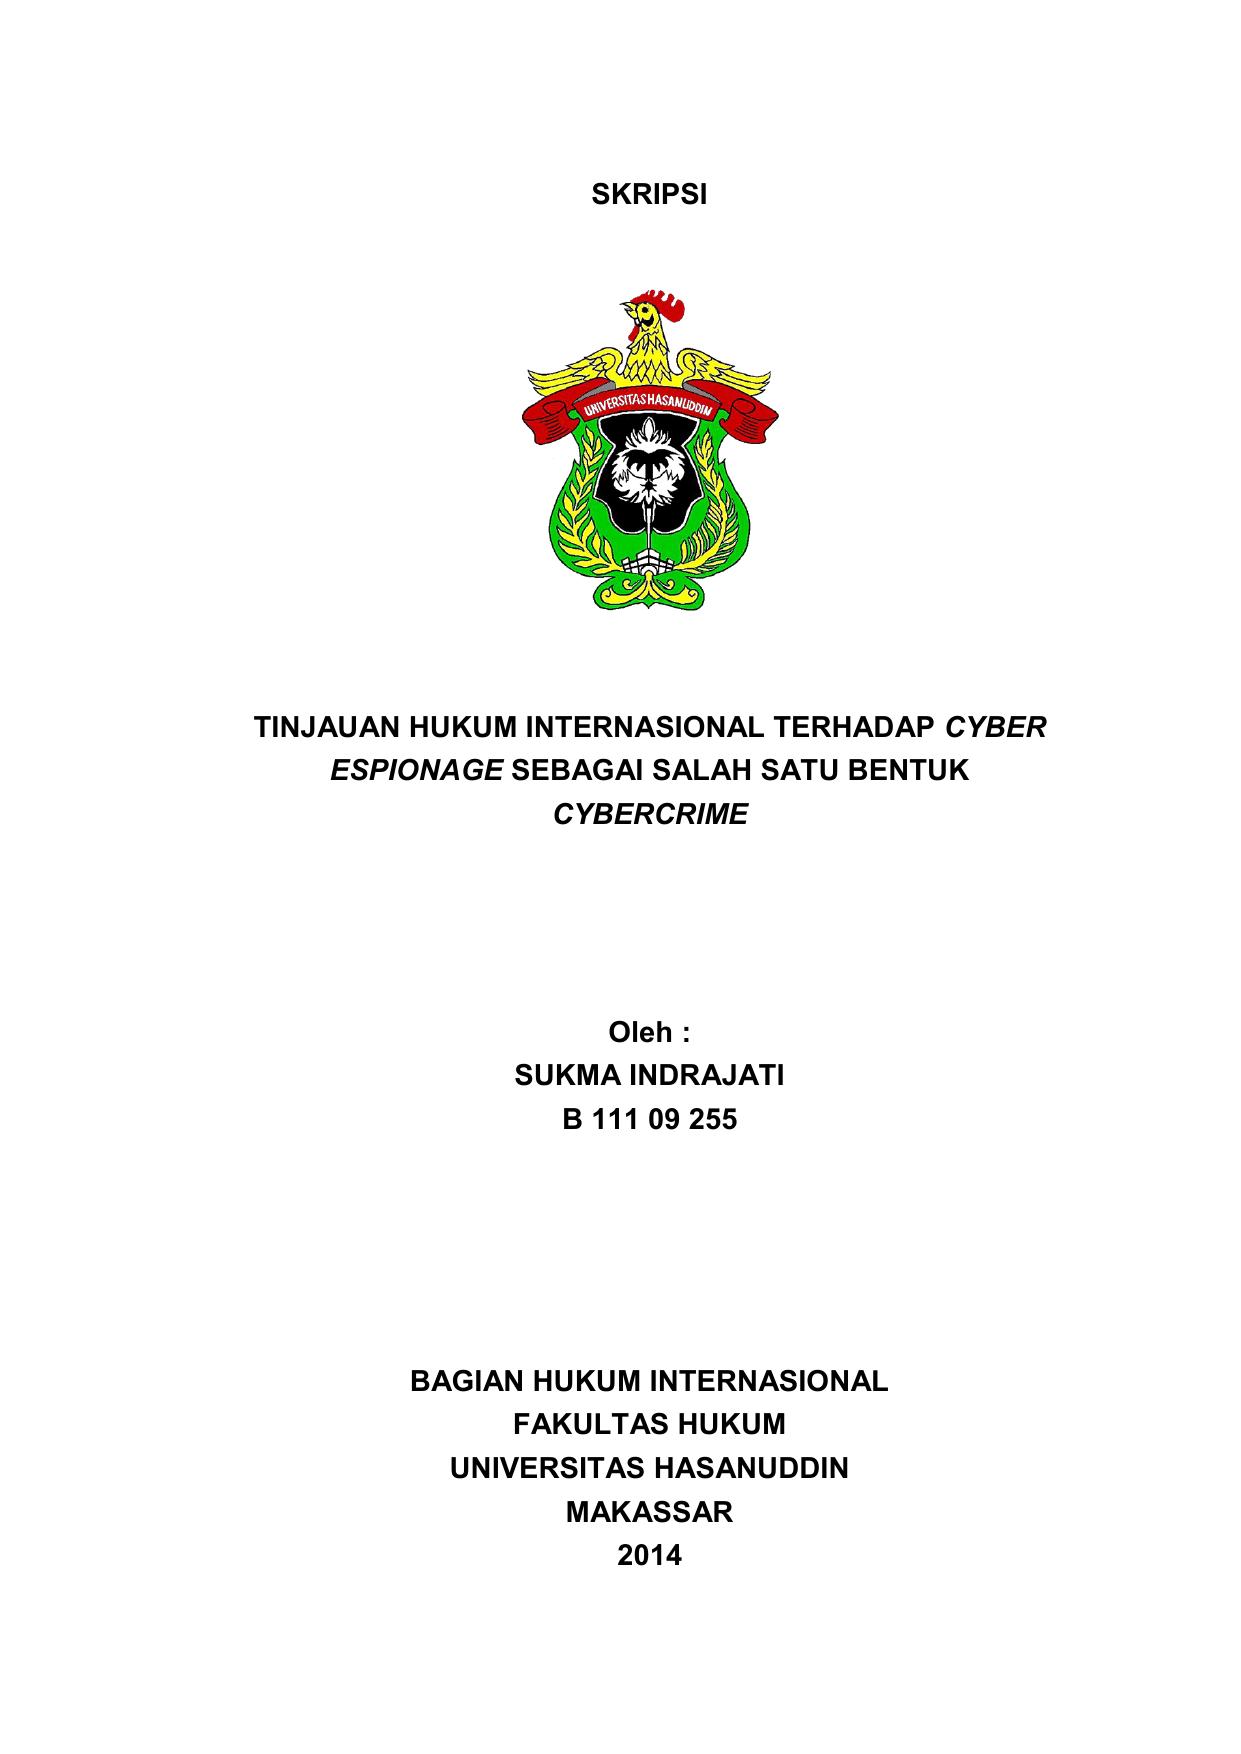 Skripsi Tinjauan Hukum Internasional Terhadap